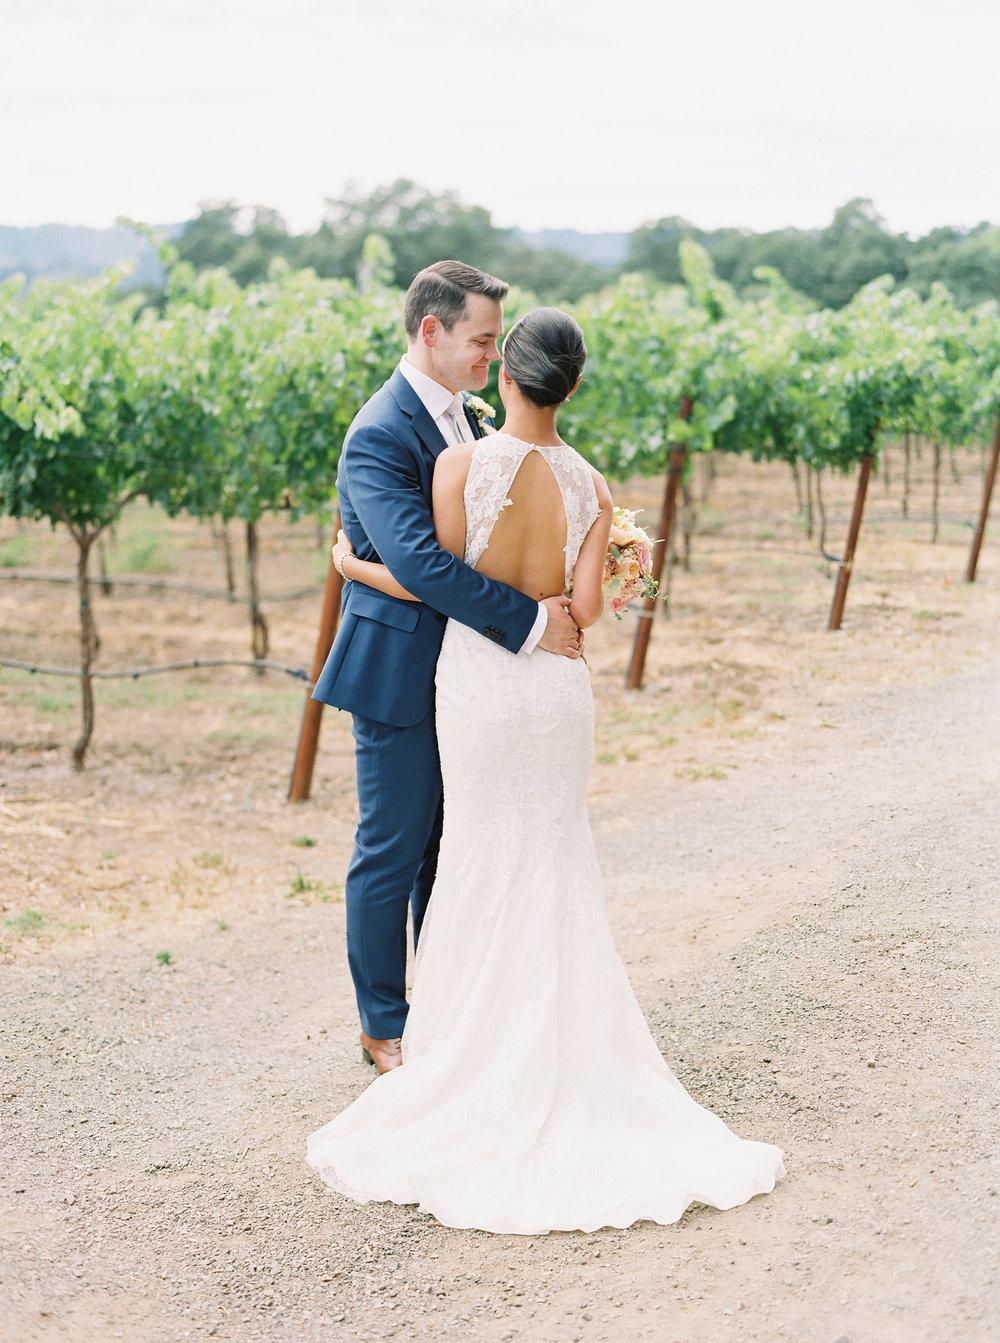 Harvest-inn-wedding-in-napa-california-260.jpg